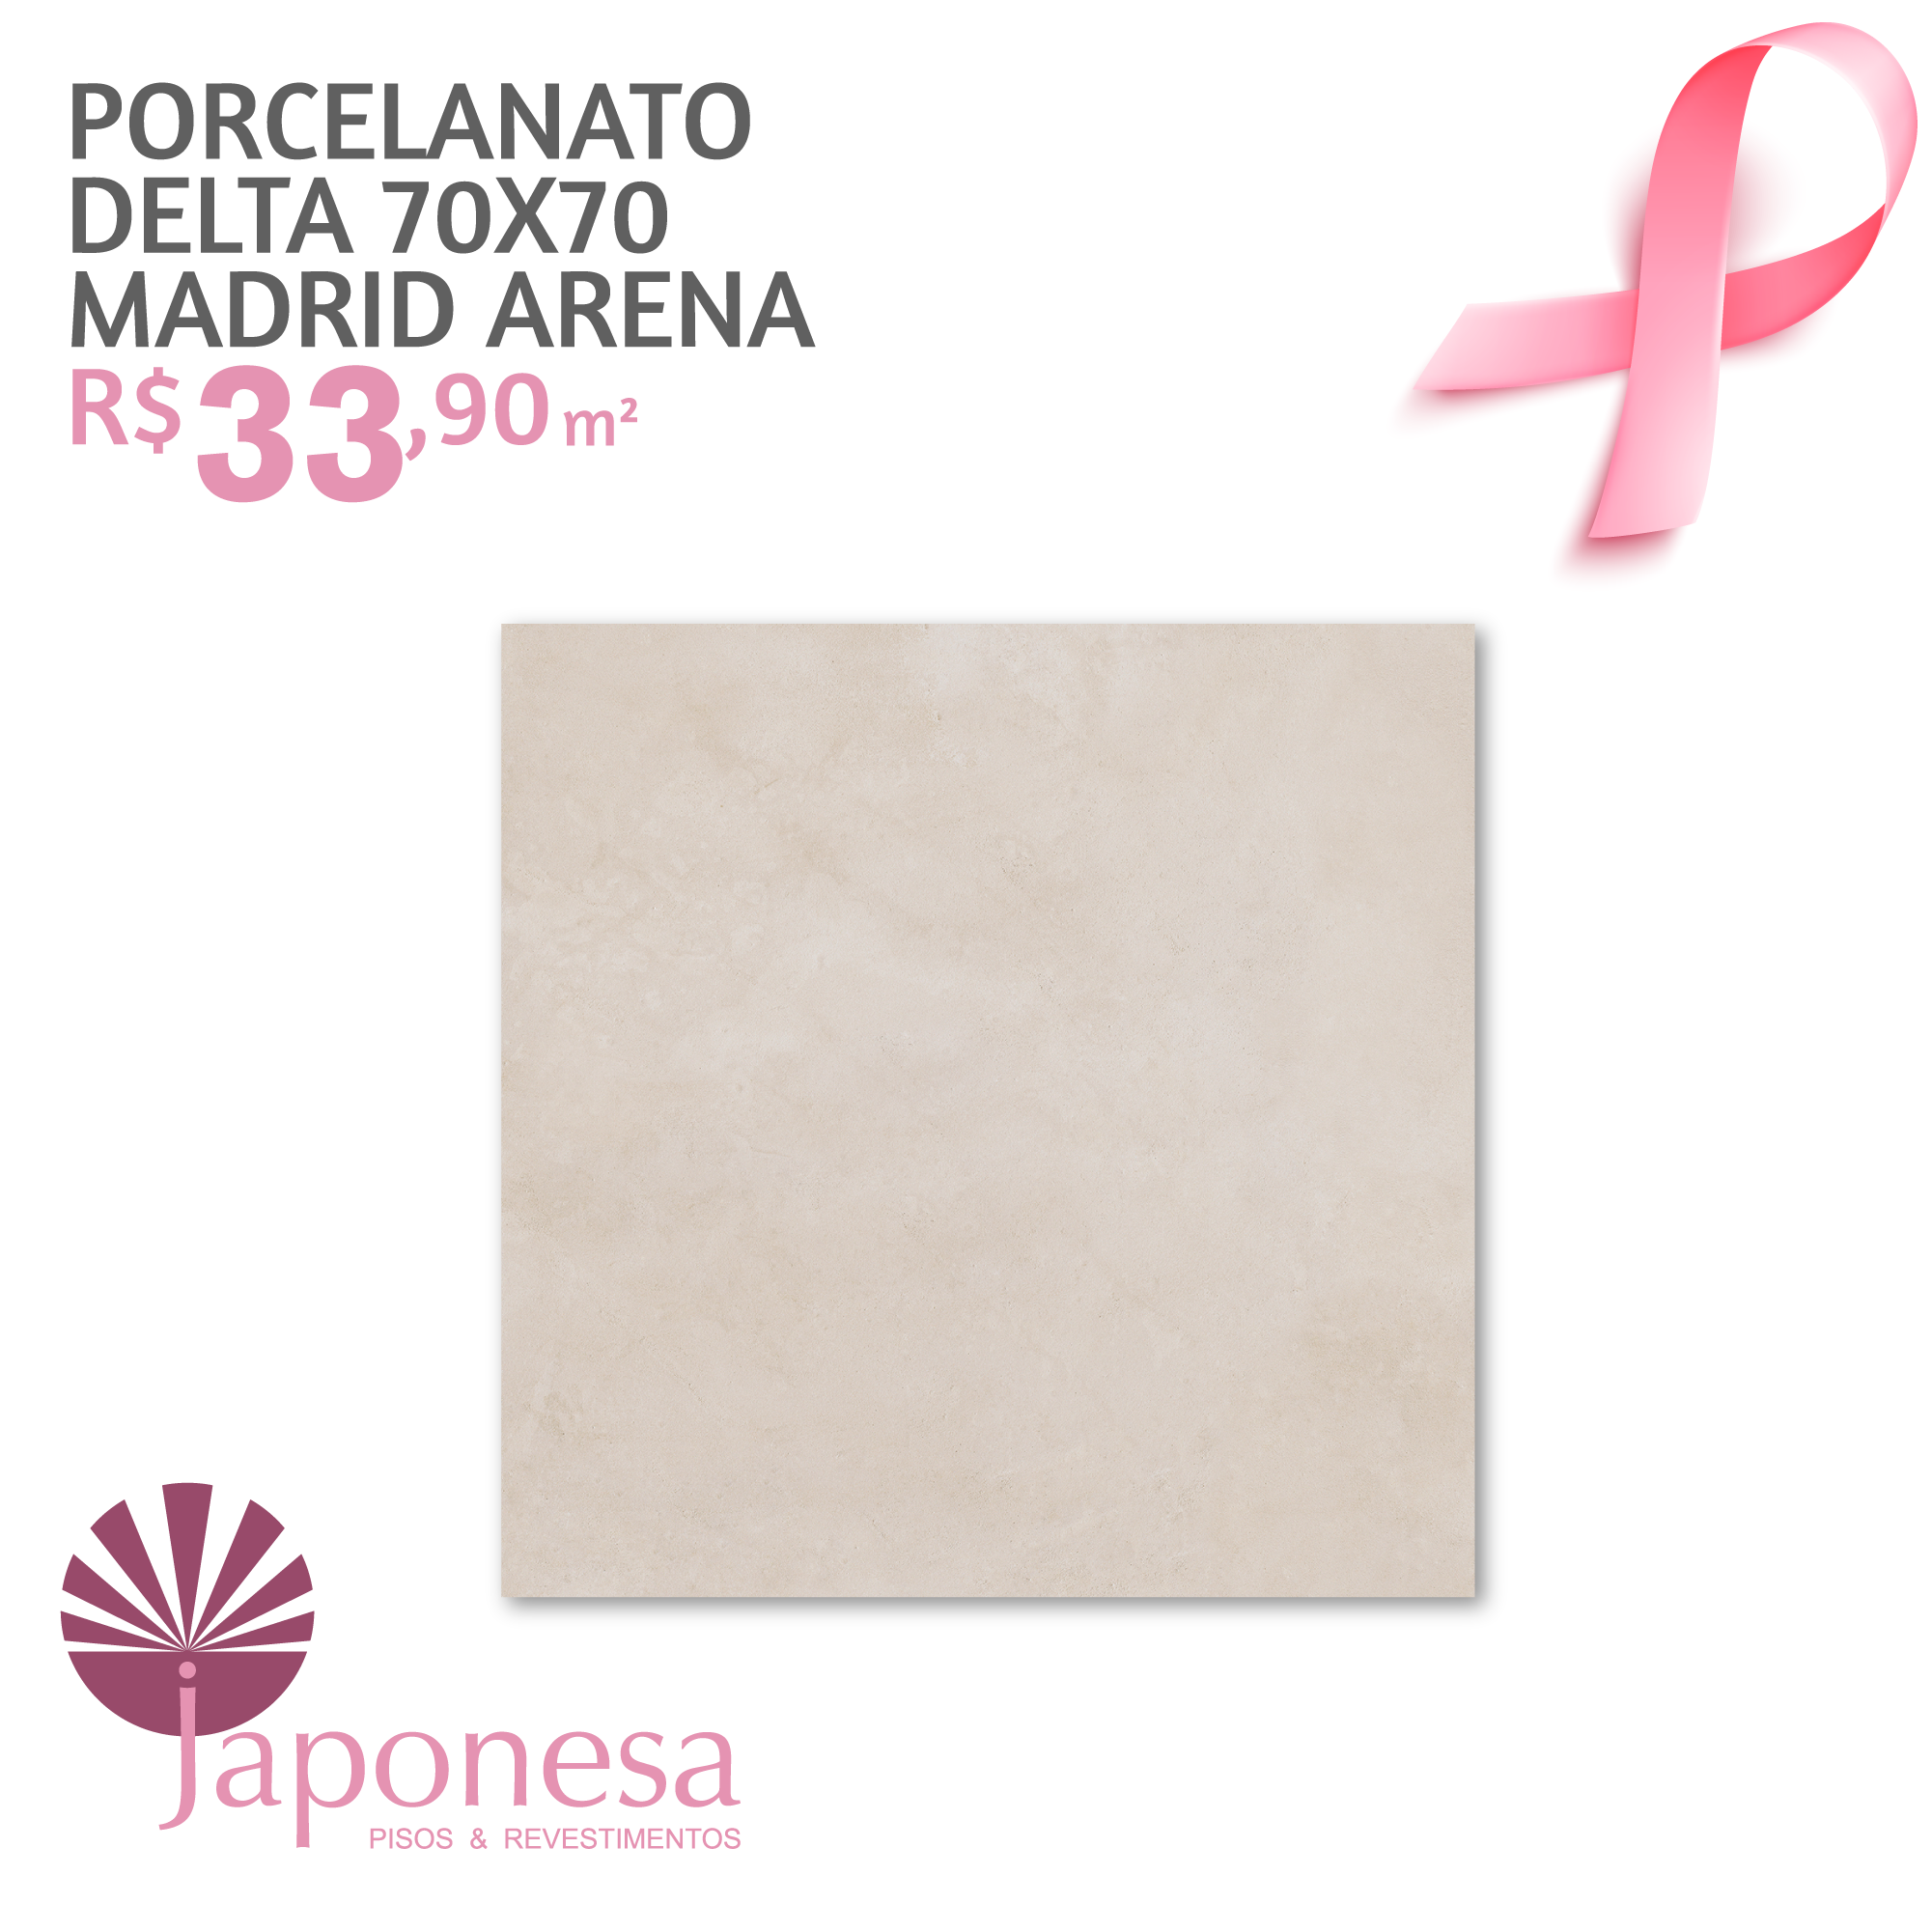 Porcelanato Delta 70×70 Madrid Arena